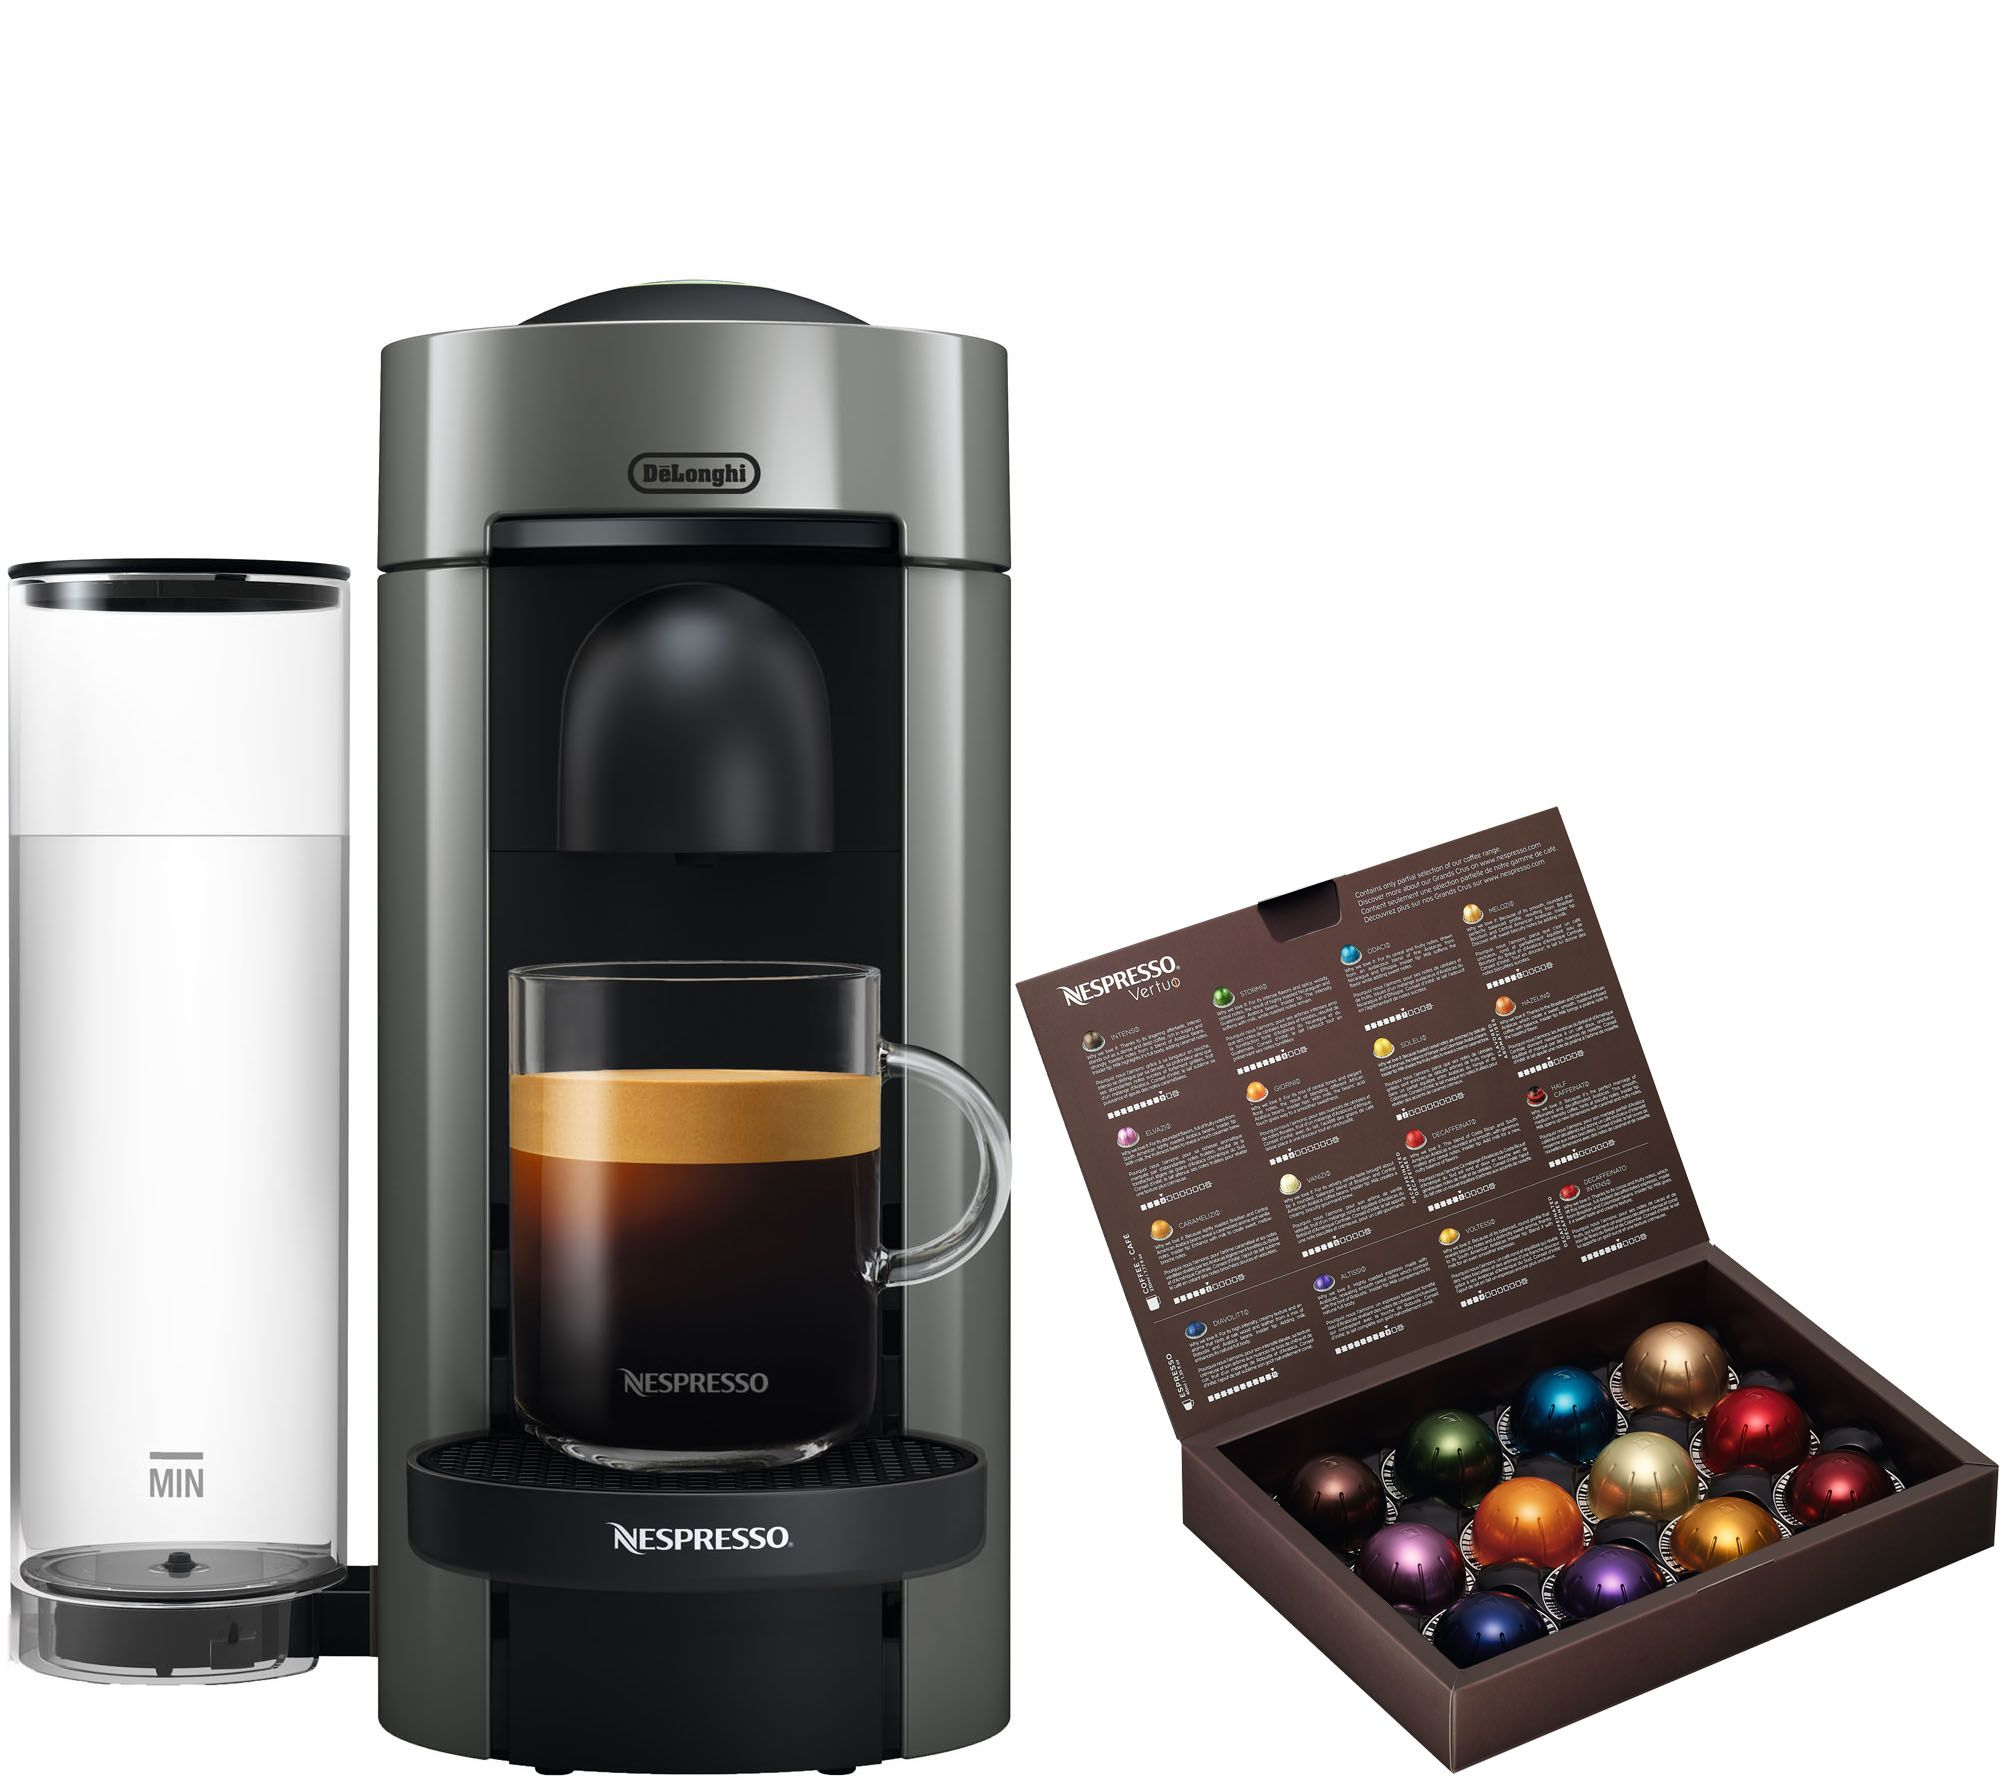 nespresso vertuo plus coffee u0026 espresso machinegrey delonghi u2014 qvccom - Nespresso Delonghi